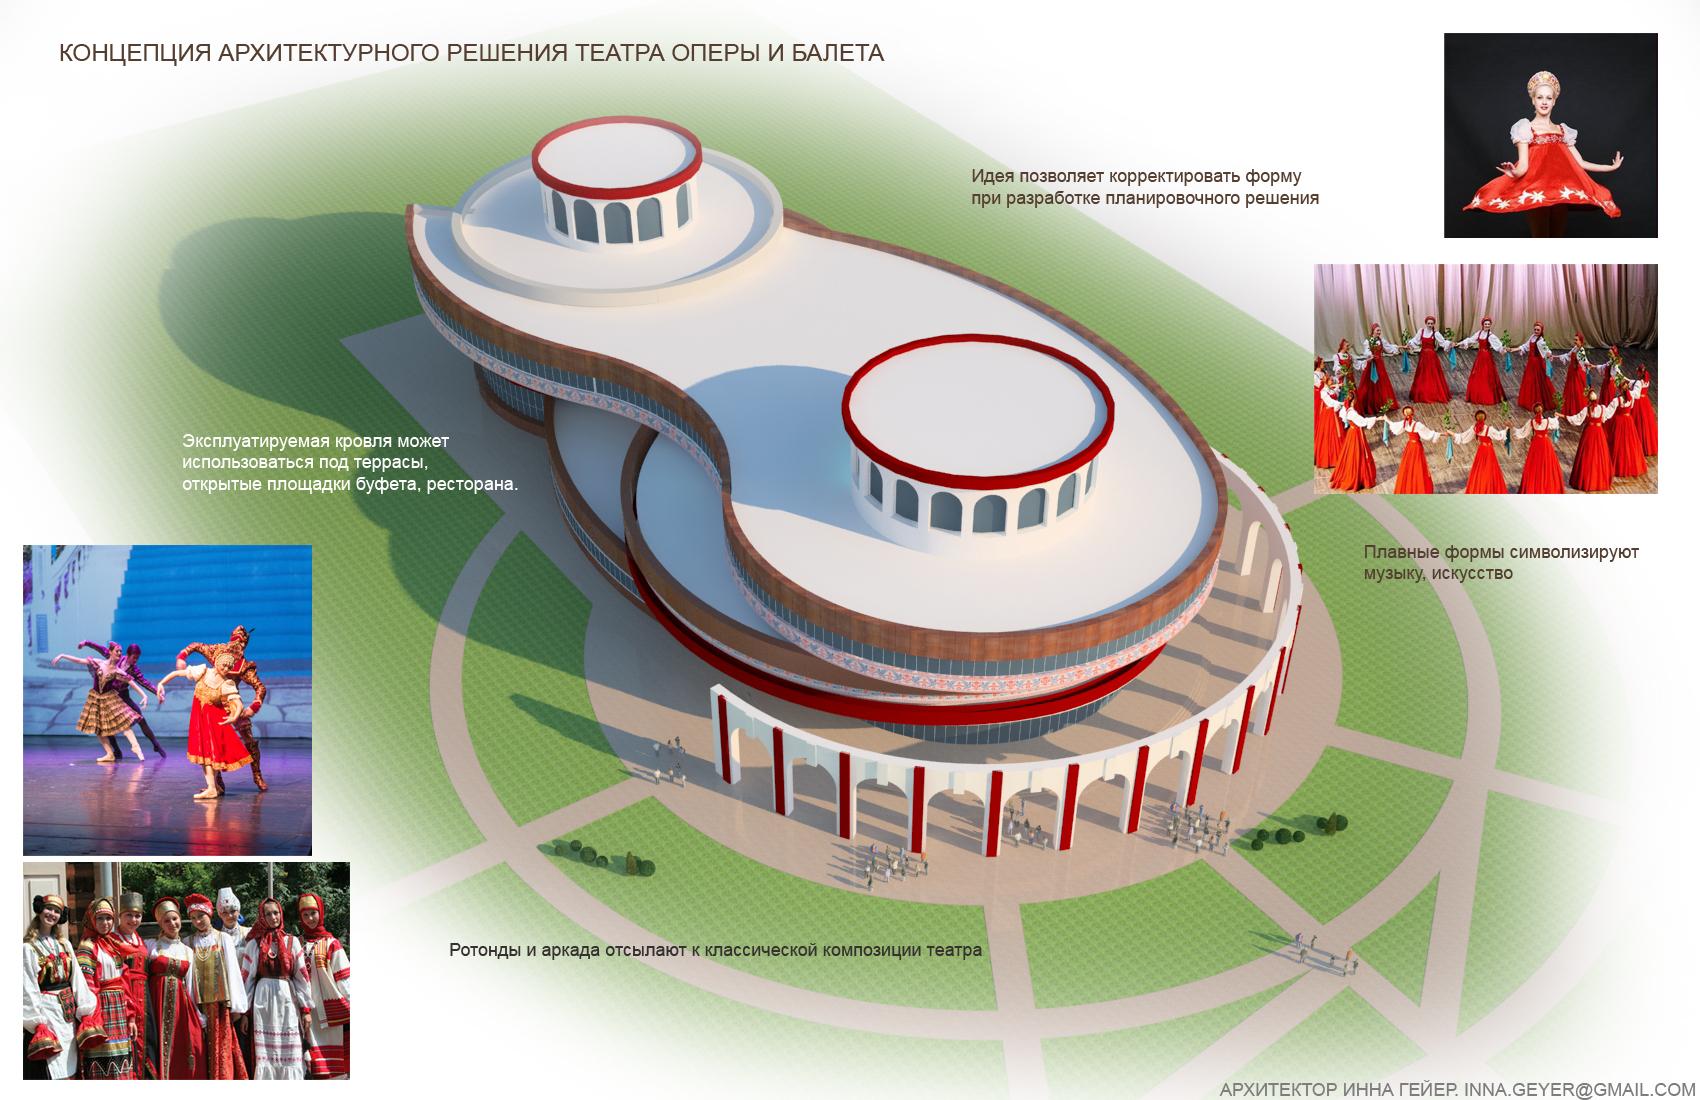 Разработка архитектурной концепции театра оперы и балета фото f_45052f4da6155652.jpg